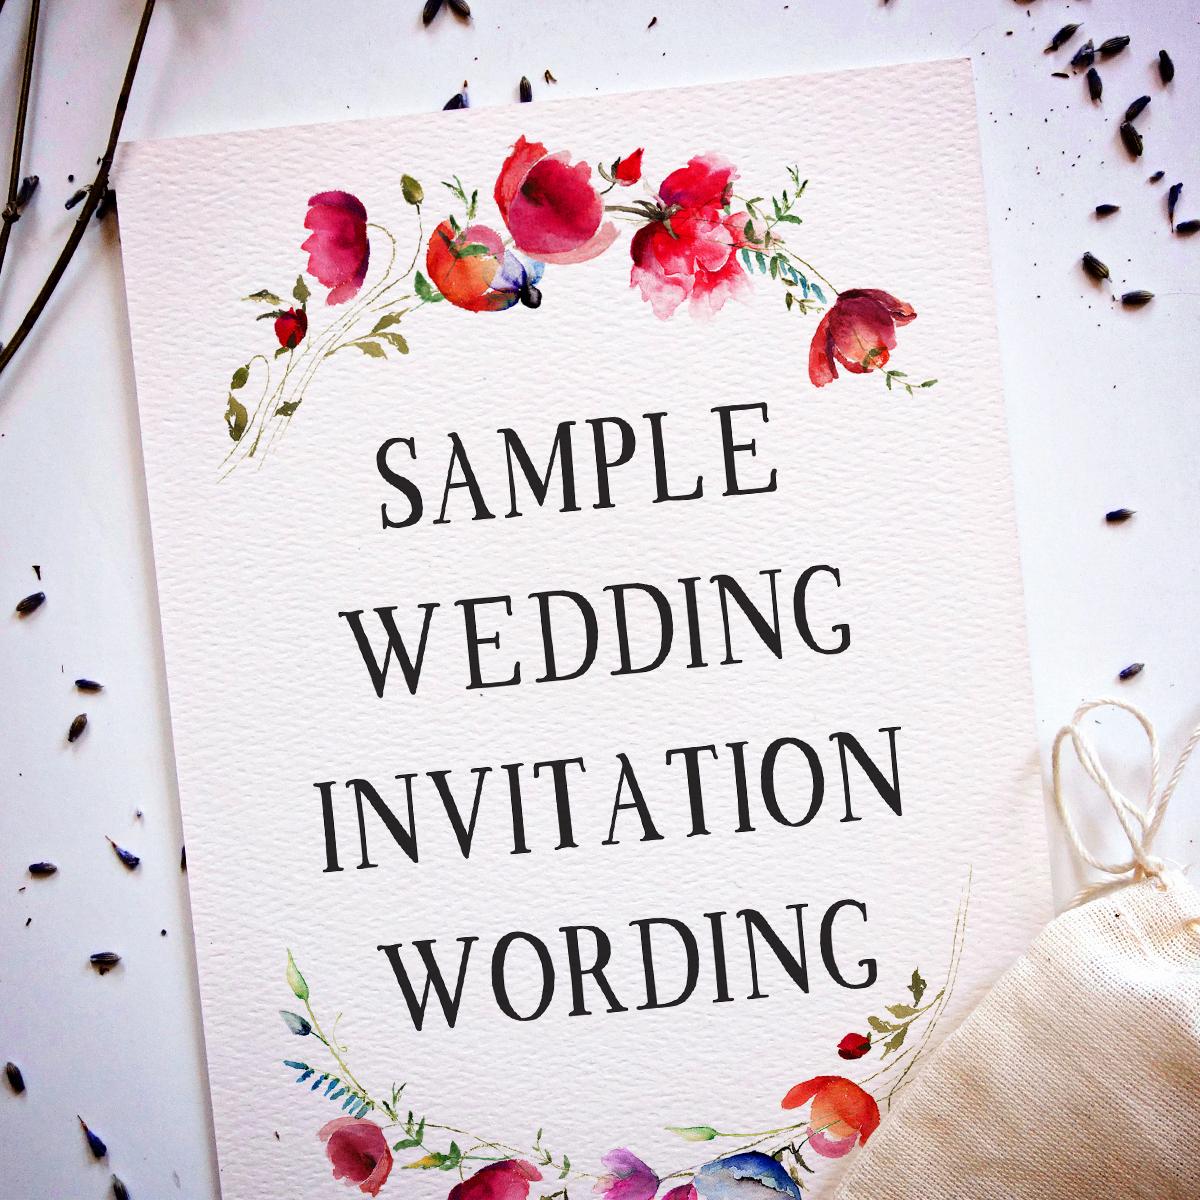 Sample Wedding Invitation Wording Beautiful Wedding Invitation Wording Samples From Traditional to